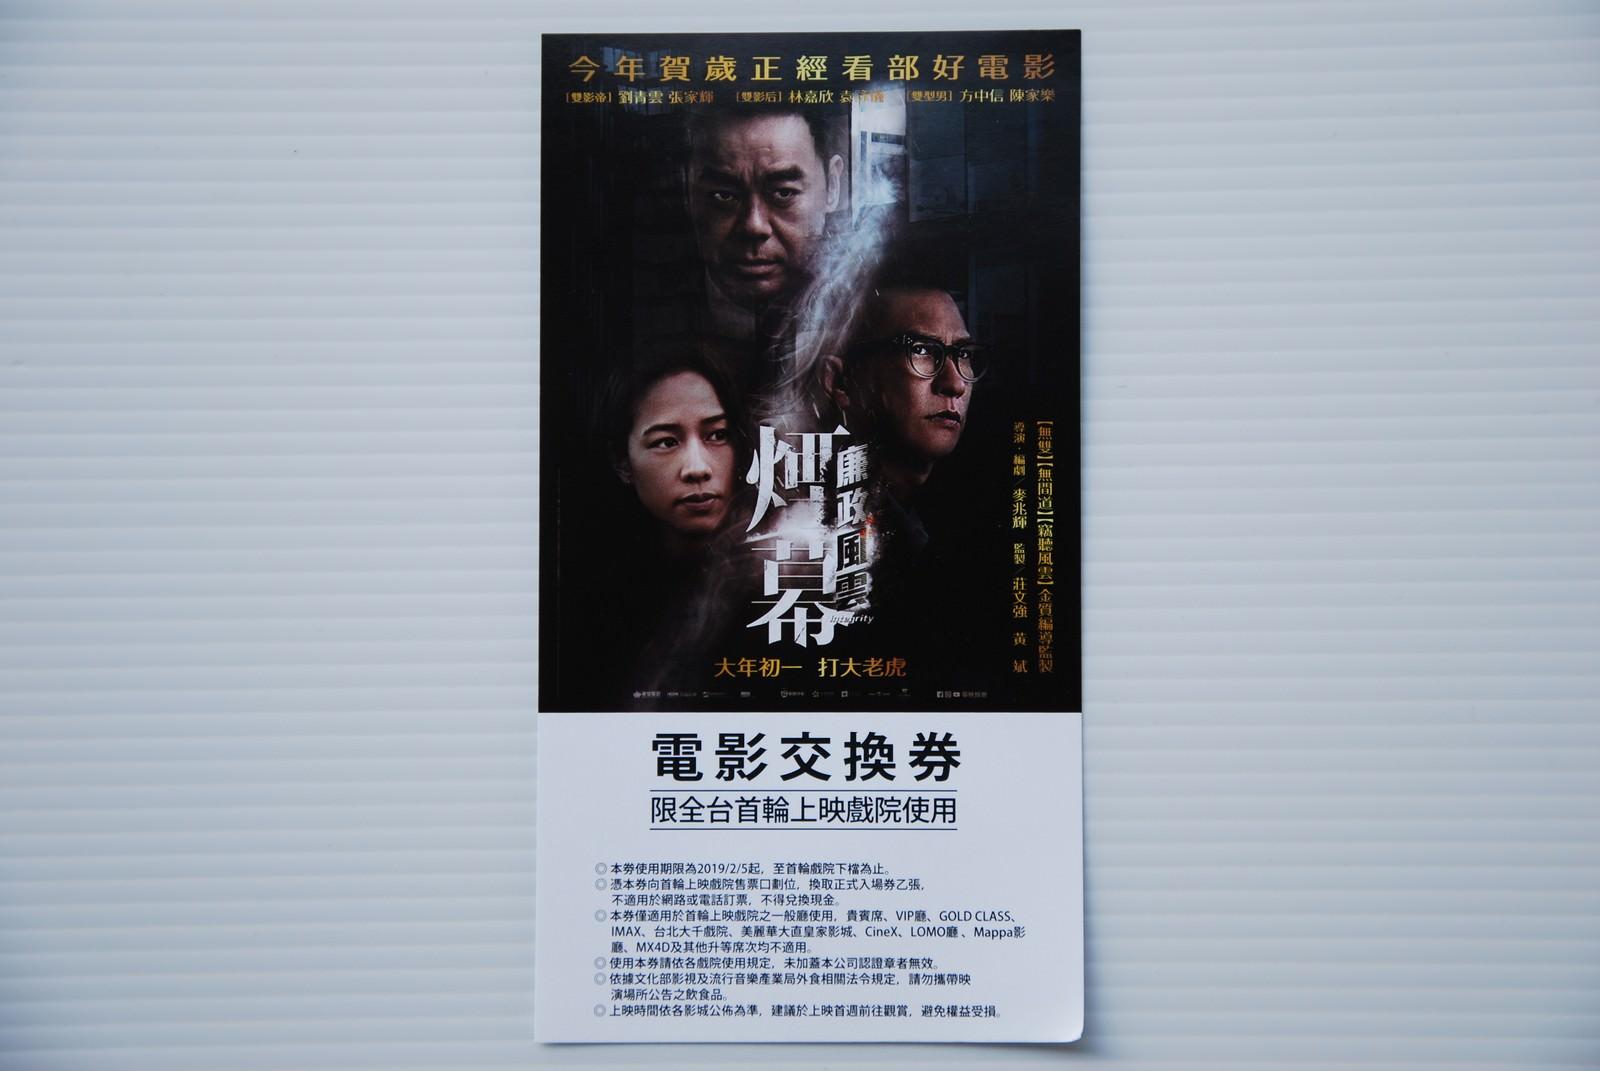 Movie, 廉政風雲 煙幕(香港, 2019年) / 廉政風雲 煙幕(台灣) / 廉政风云(中國) / Integrity(英文), 電影交換券